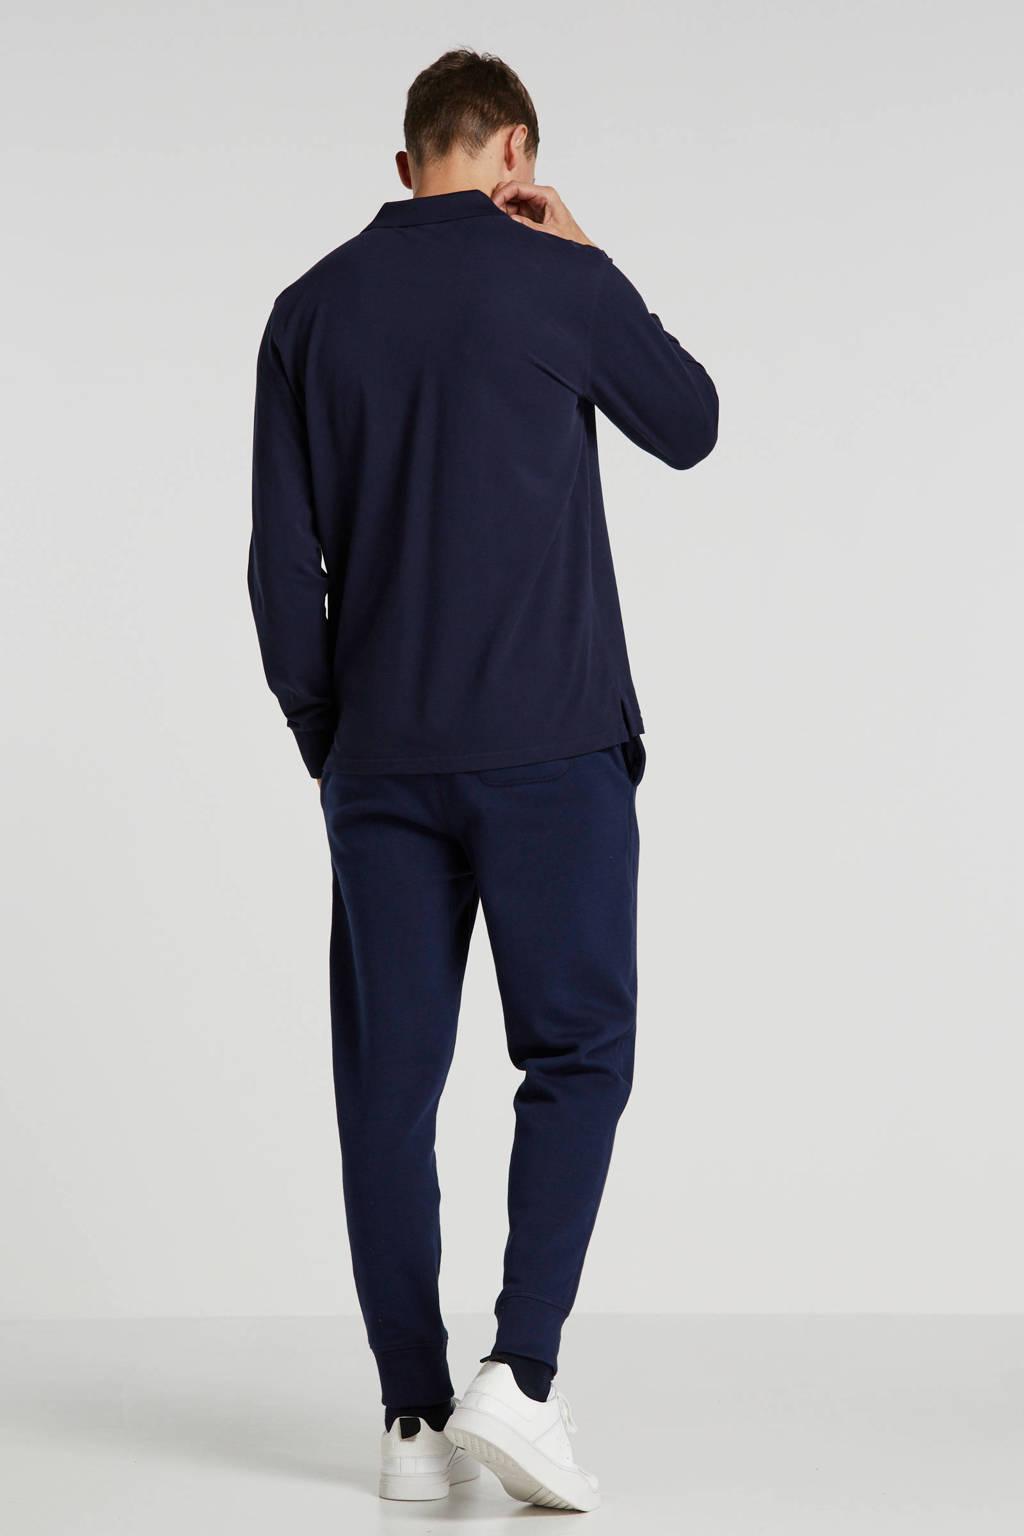 GANT kanten regular fit polo donkerblauw, Donkerblauw